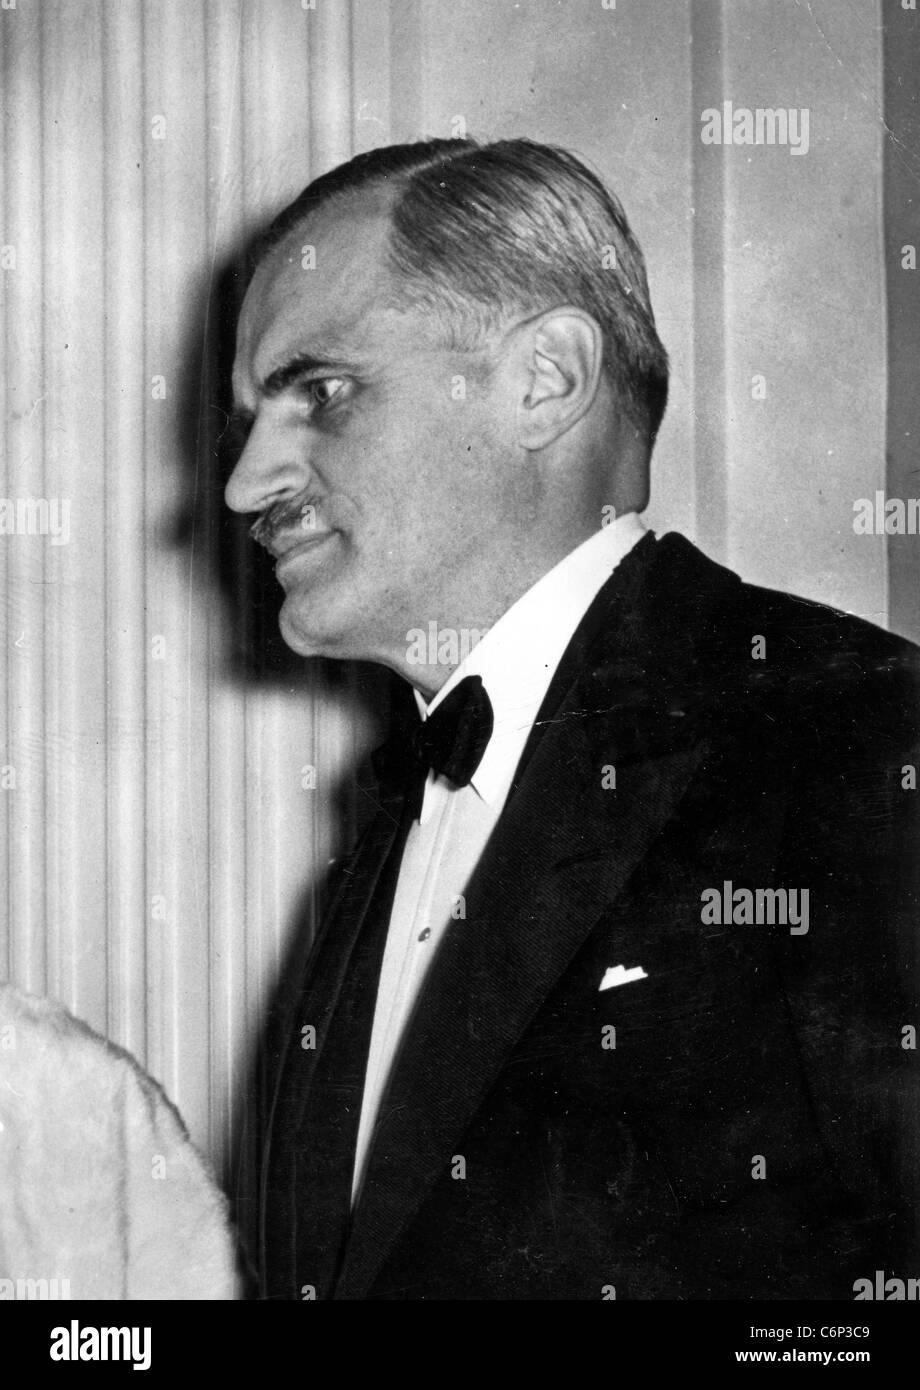 ARTHUR H. COMPTON (1892-1962) US Kernphysiker und Nobelpreisträger hier im Jahre 1942 Stockbild